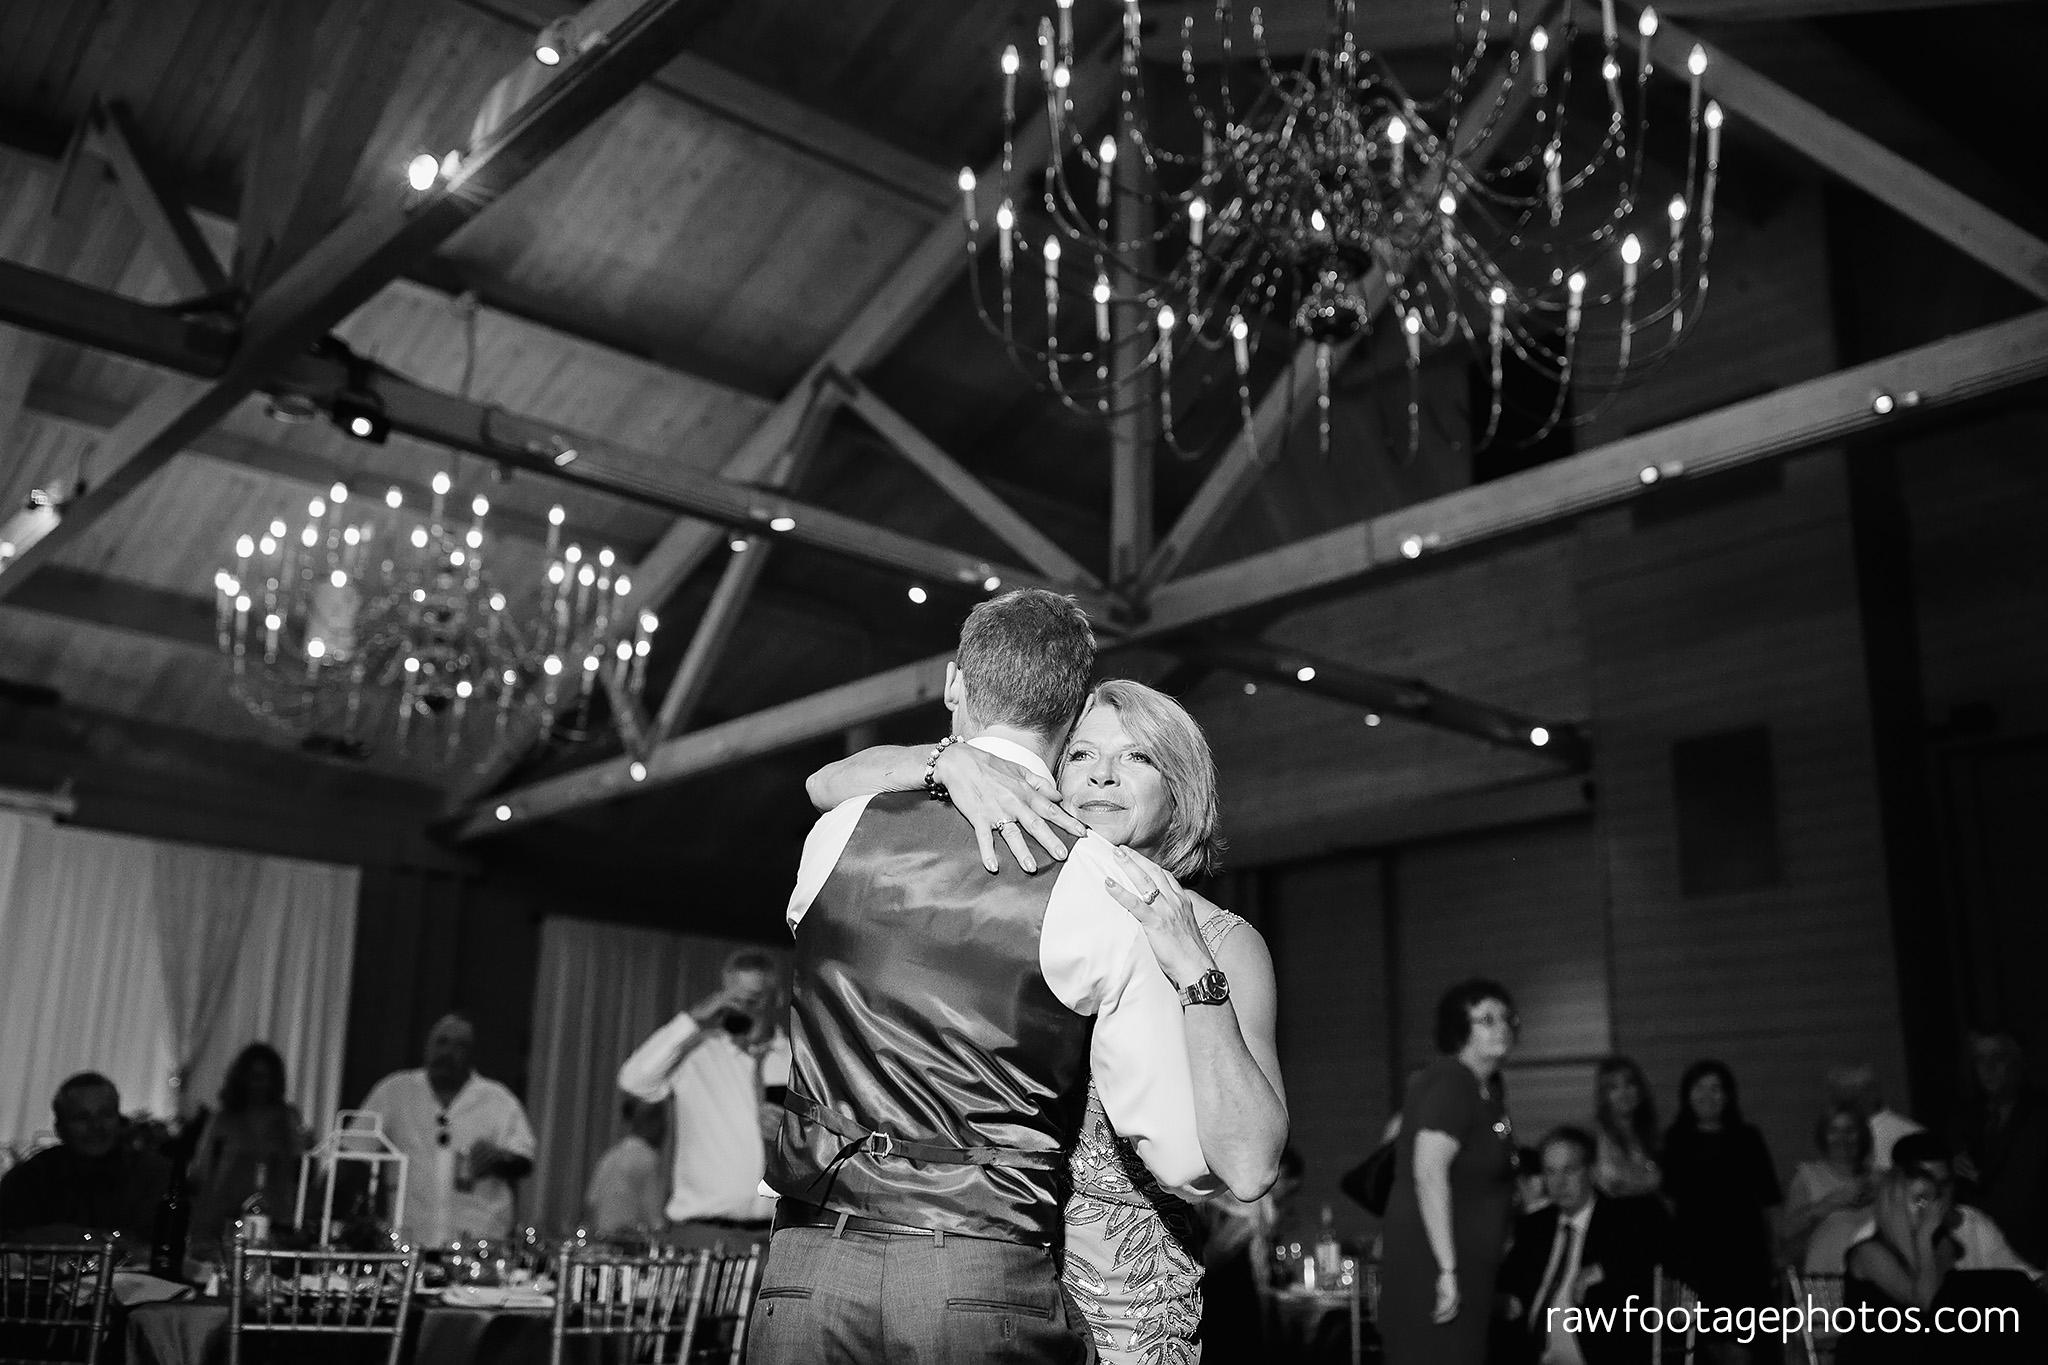 london_ontario_wedding_photographer-grand_bend_wedding_photographer-oakwood_resort_wedding-beach_wedding-sunset_wedding-raw_footage_photography076.jpg